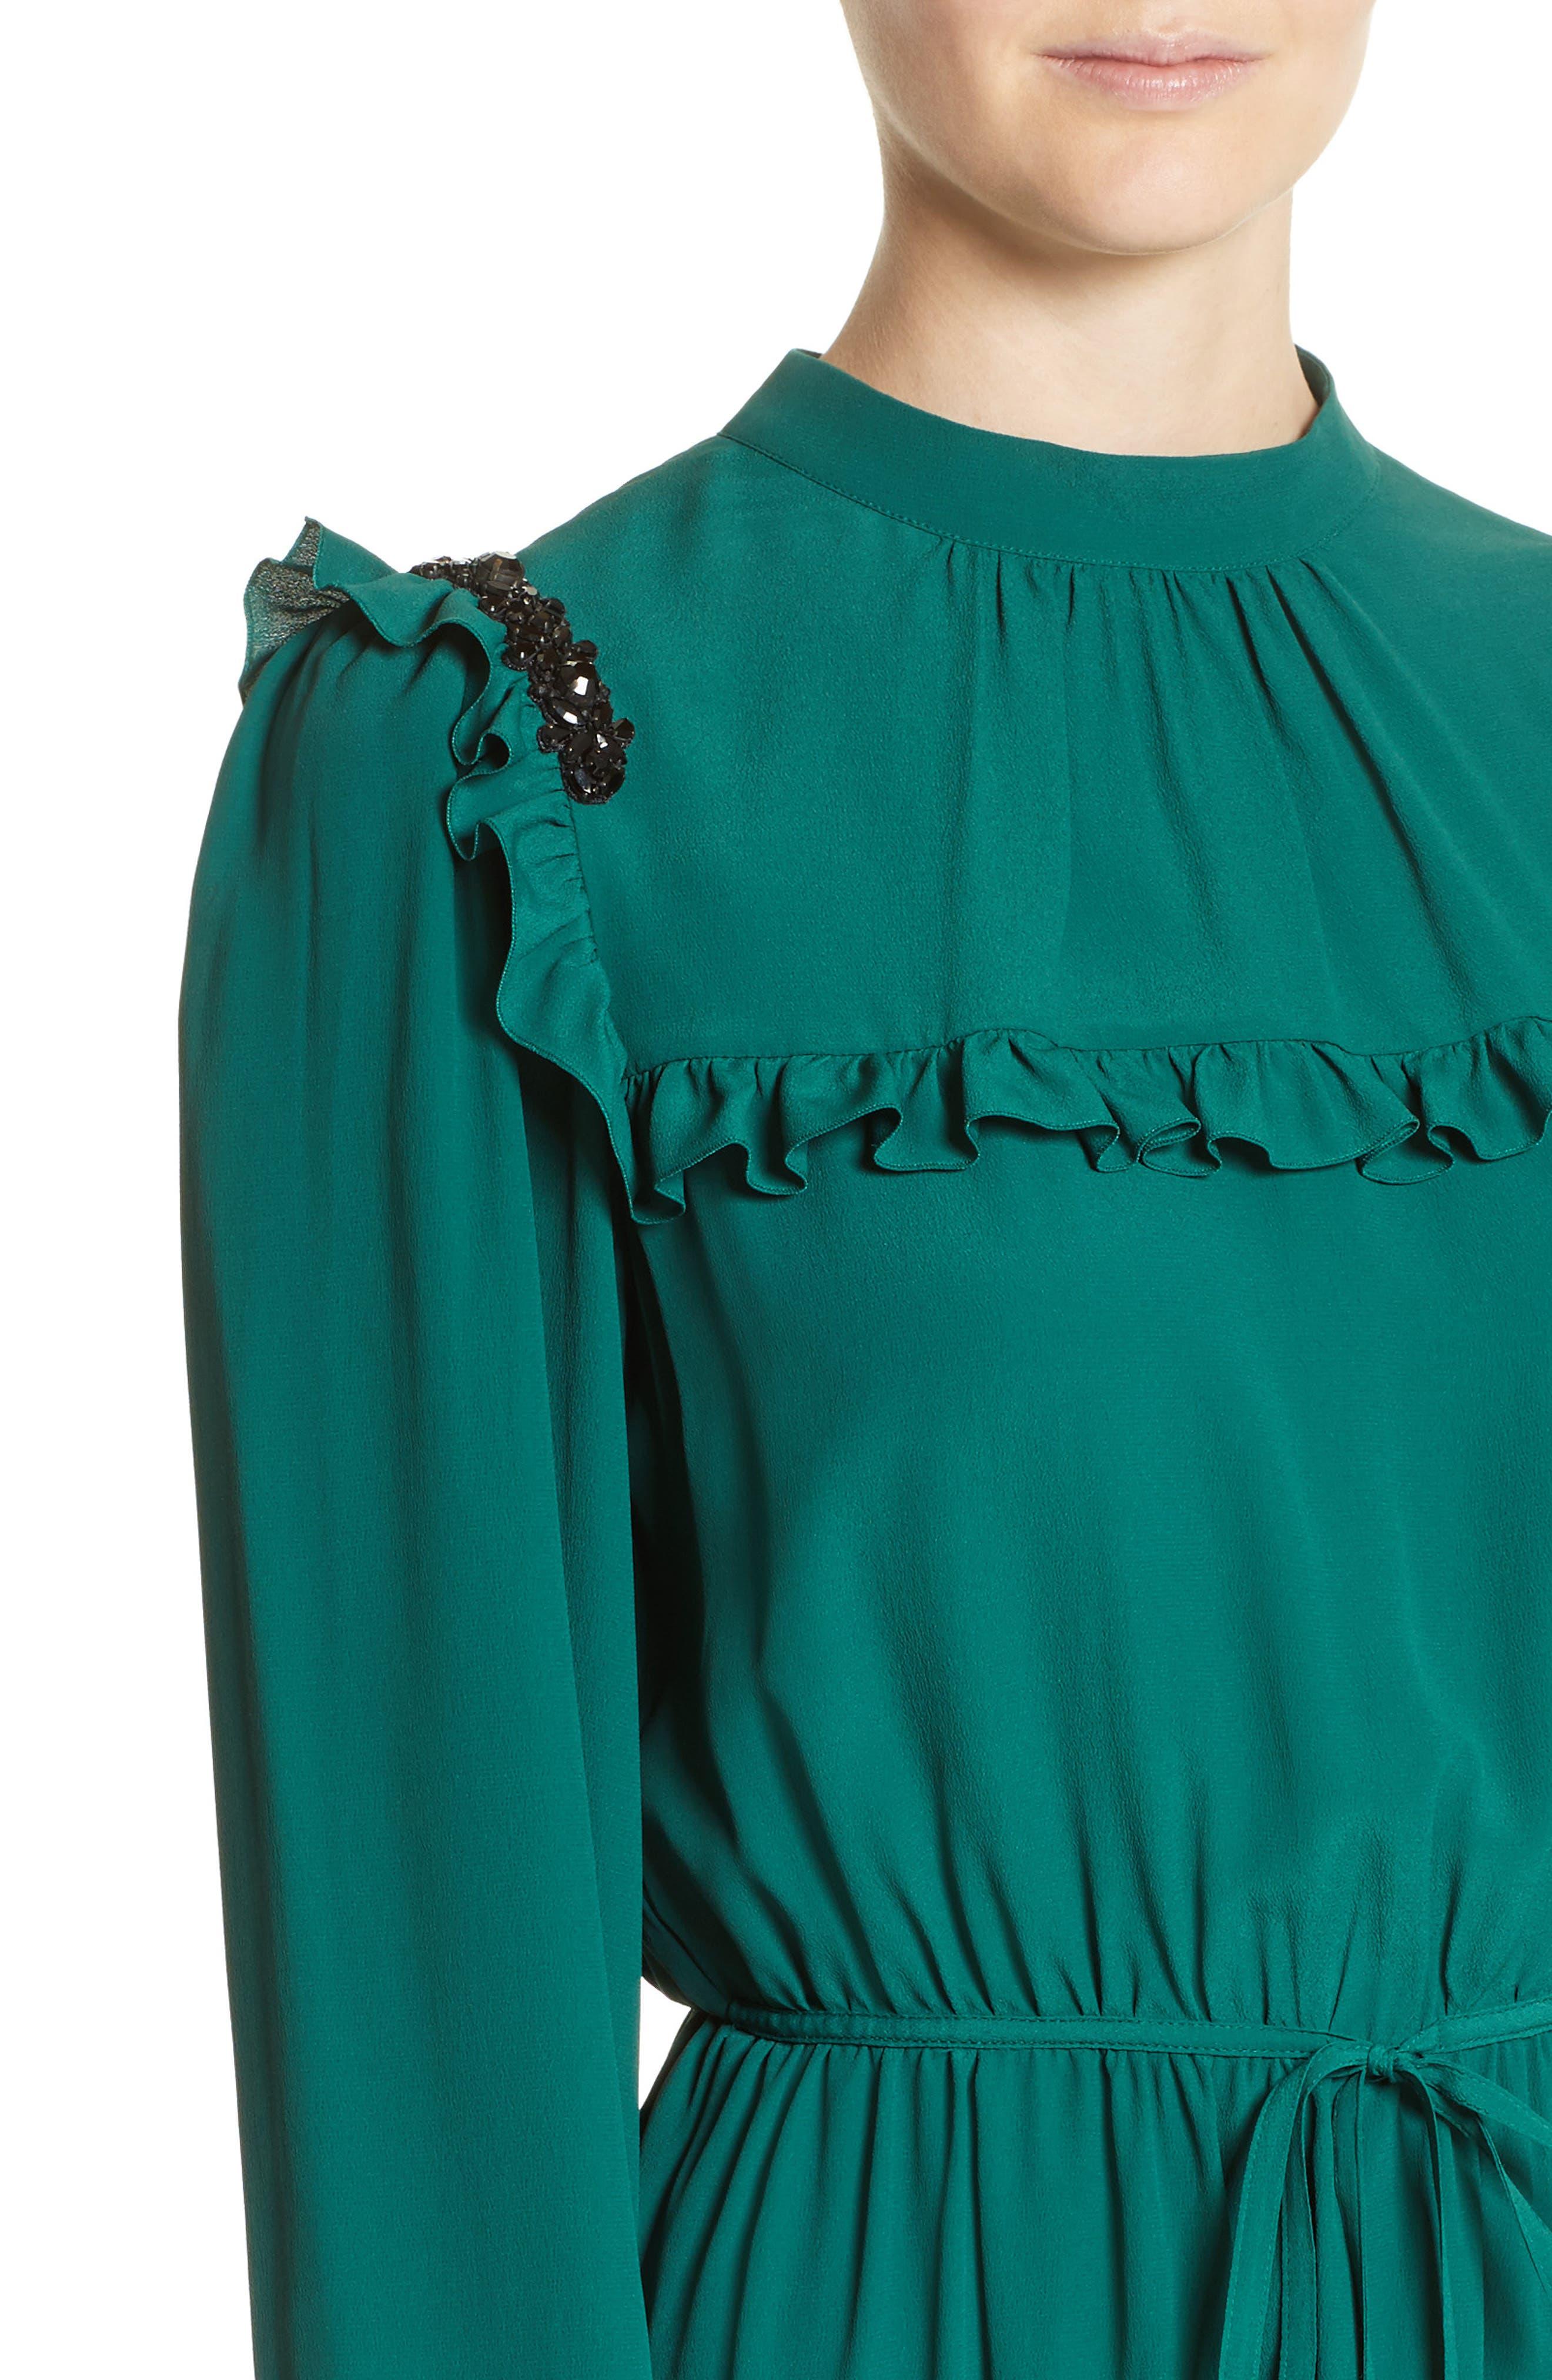 Crystal Embellished Ruffle Dress,                             Alternate thumbnail 4, color,                             300